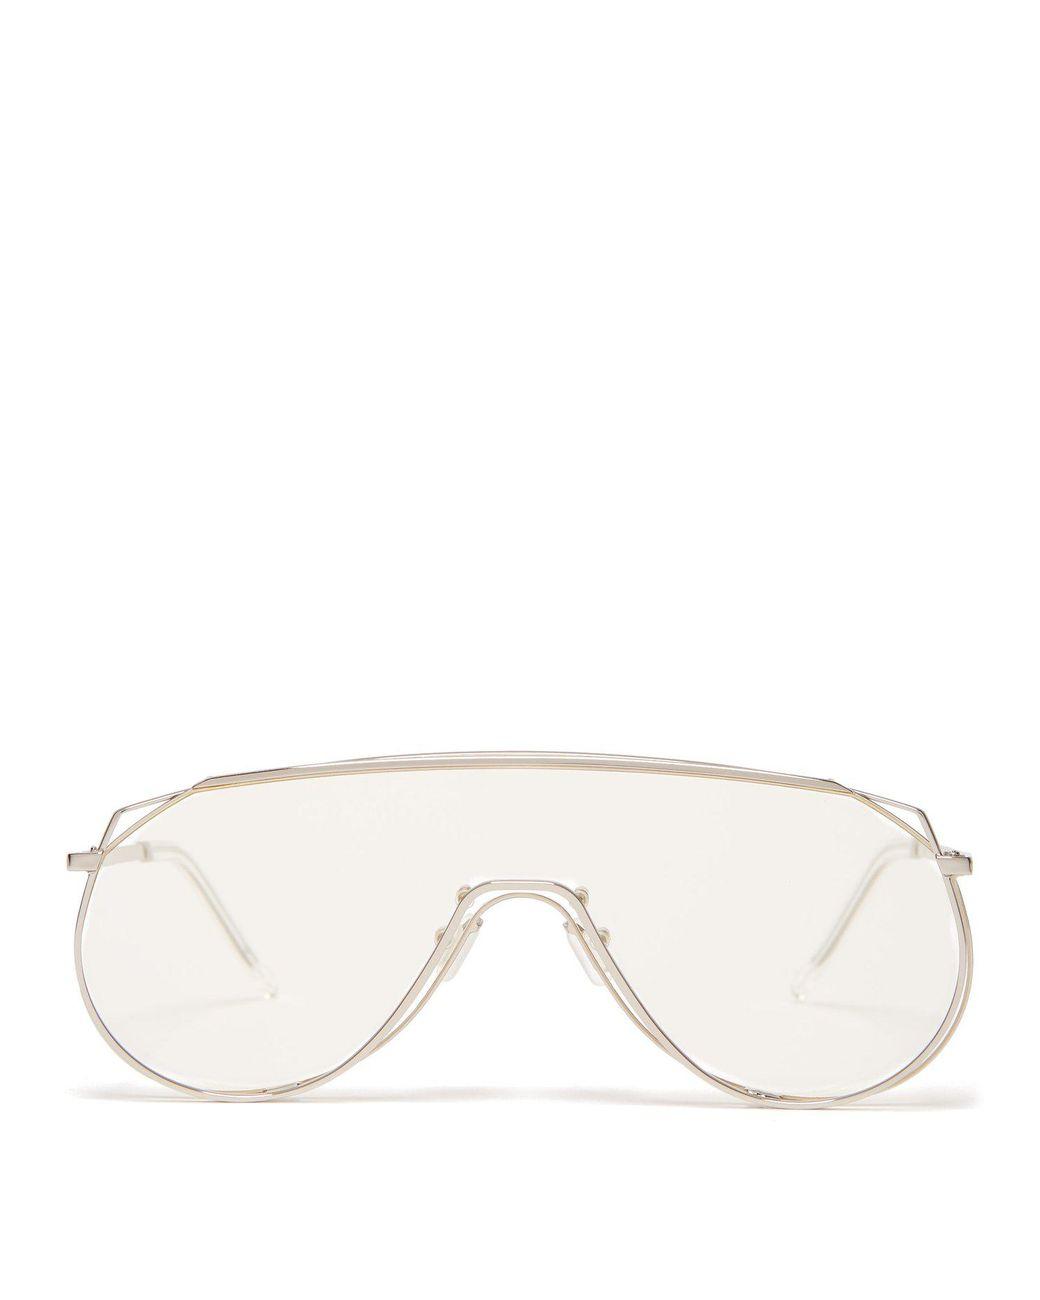 da9563949358 Lyst - Gentle Monster Afix 02 Glasses in Metallic for Men